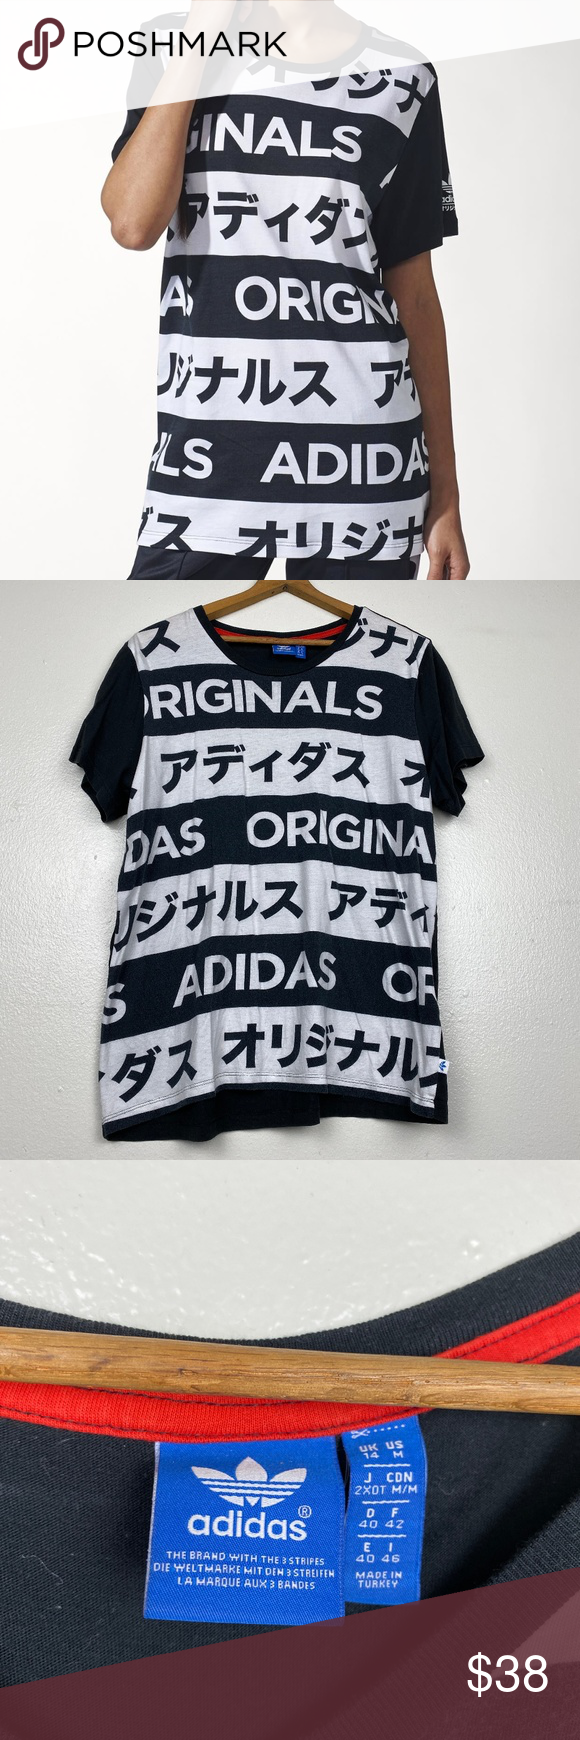 Adidas Originals Allover Typo Tee Clothes Design Typo Tees Tees [ 1740 x 580 Pixel ]